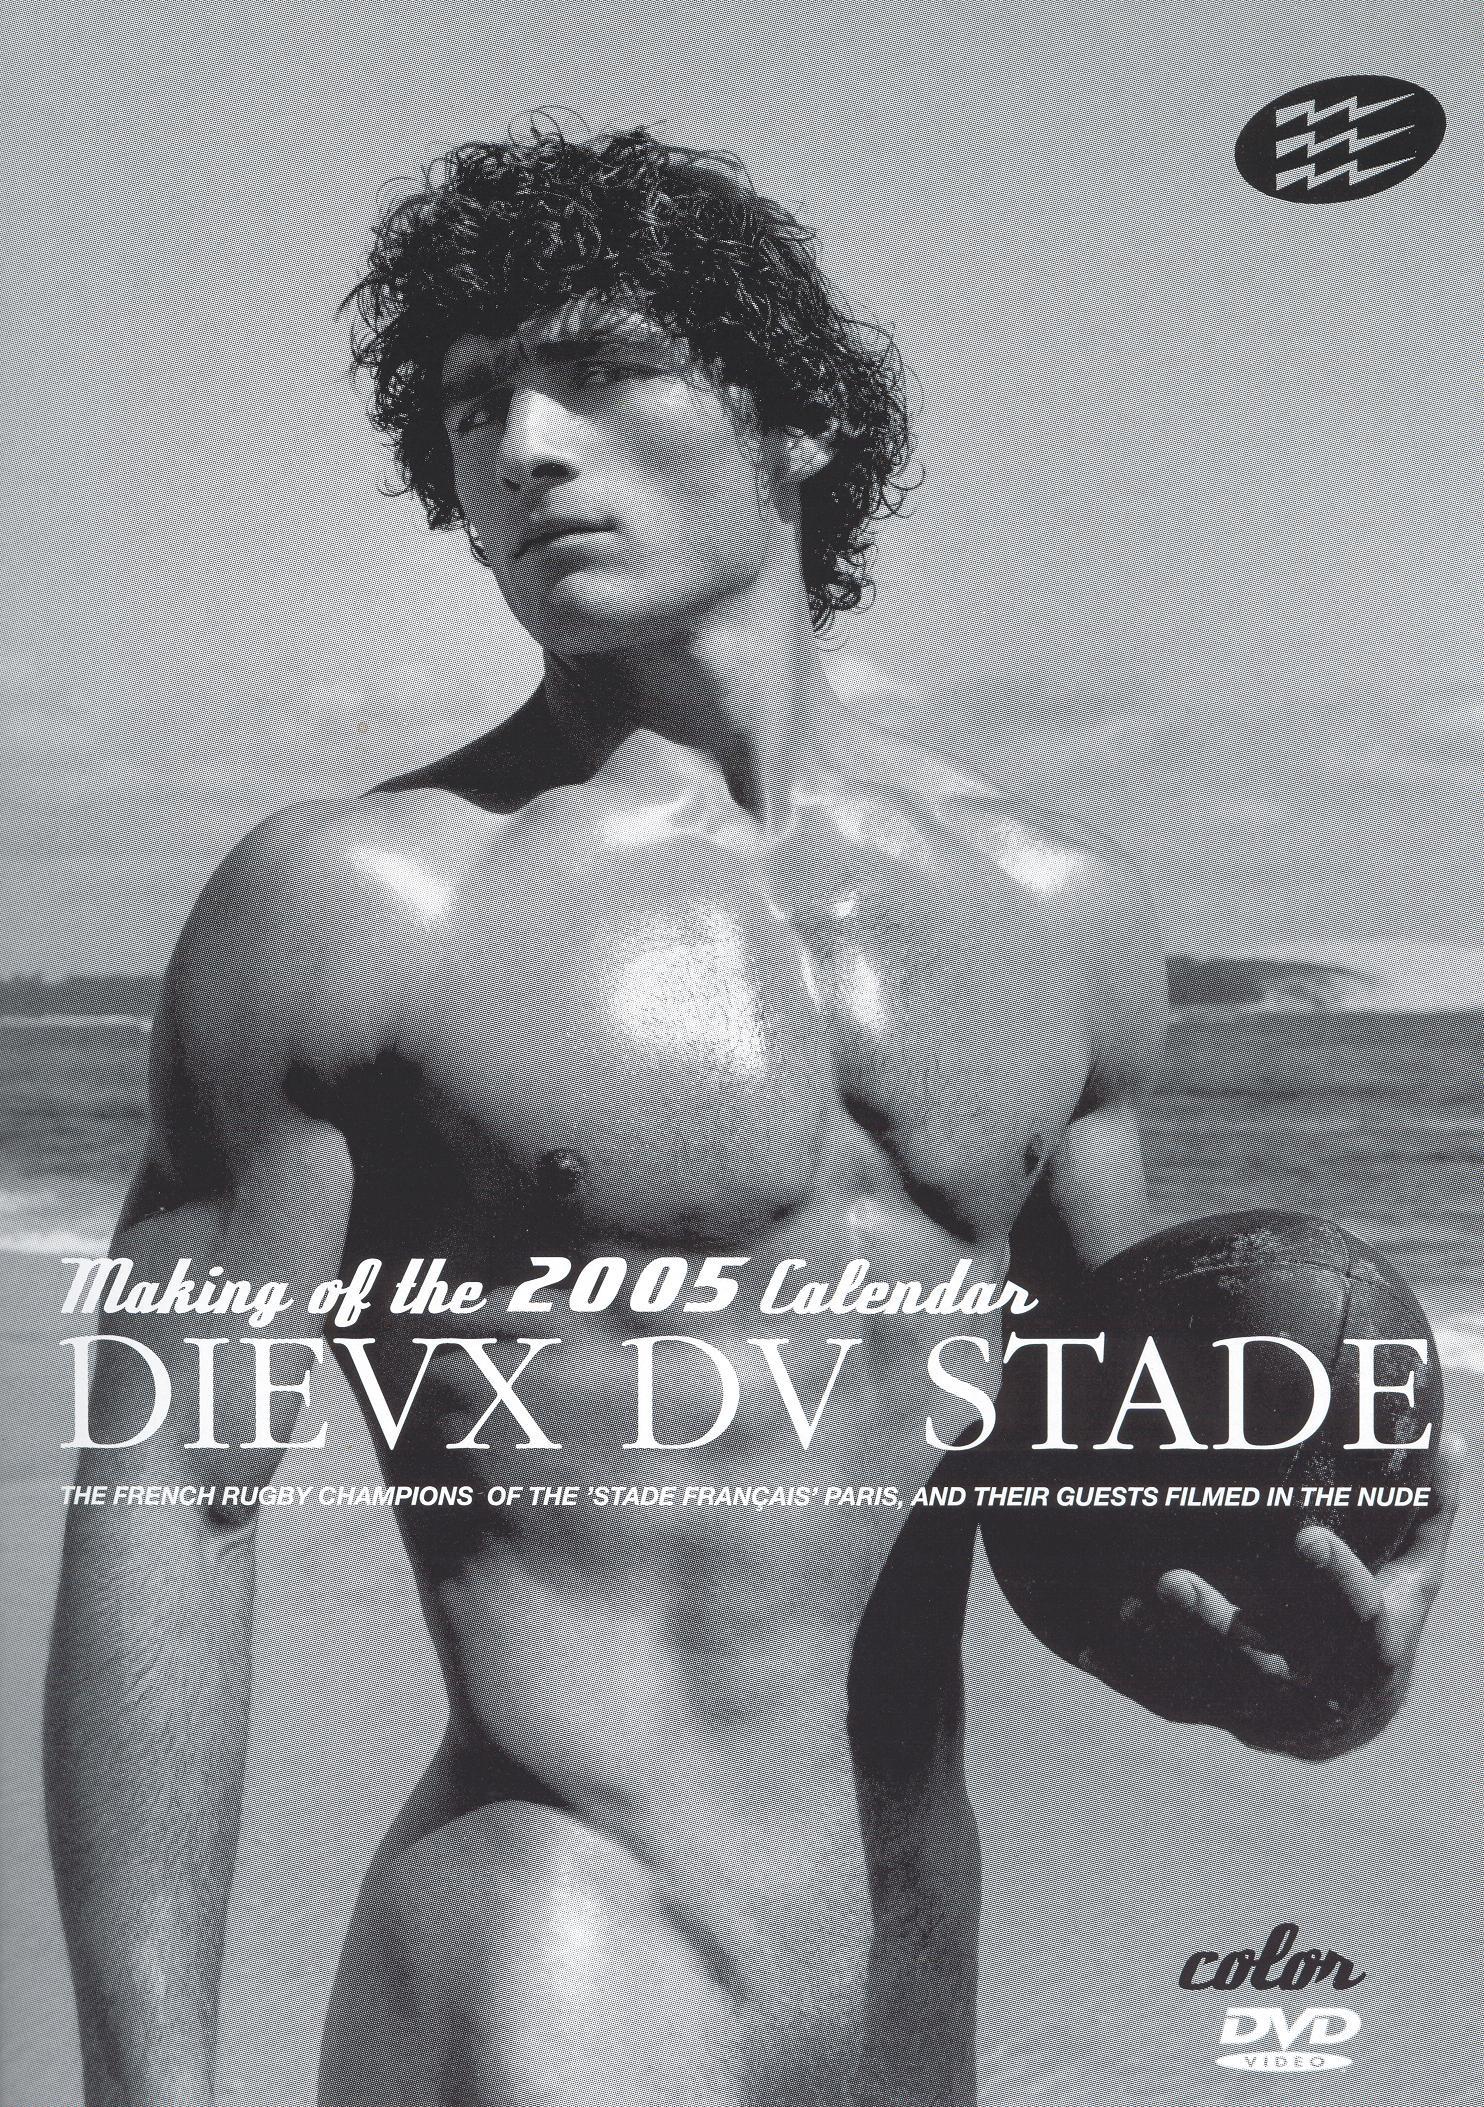 Dieux du Stade: Making of the 2005 Calendar